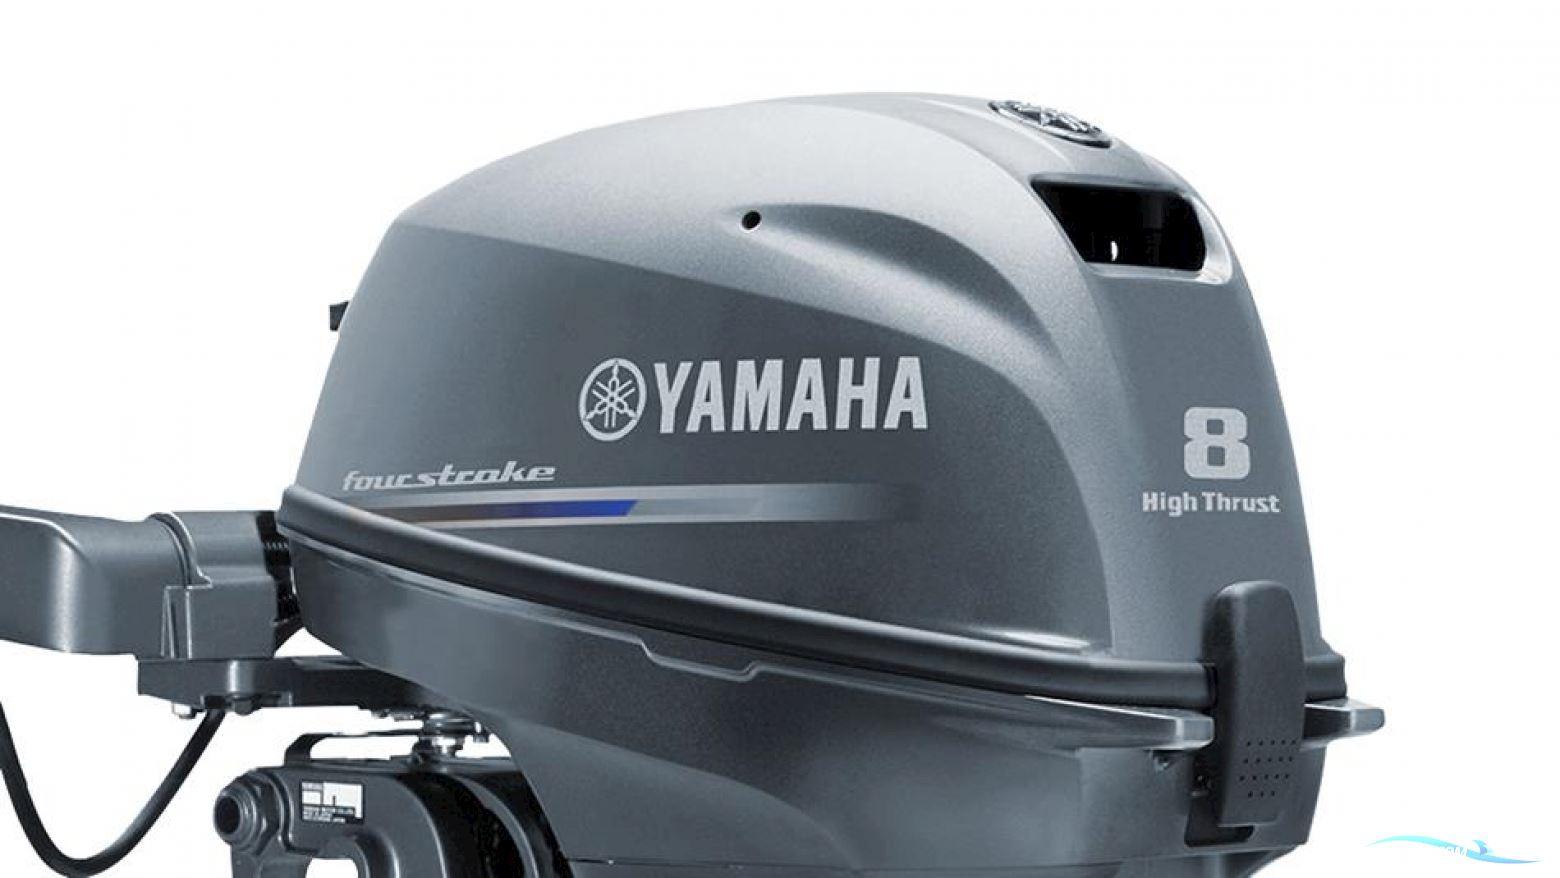 Yamaha FT8Gel/X High Thrust